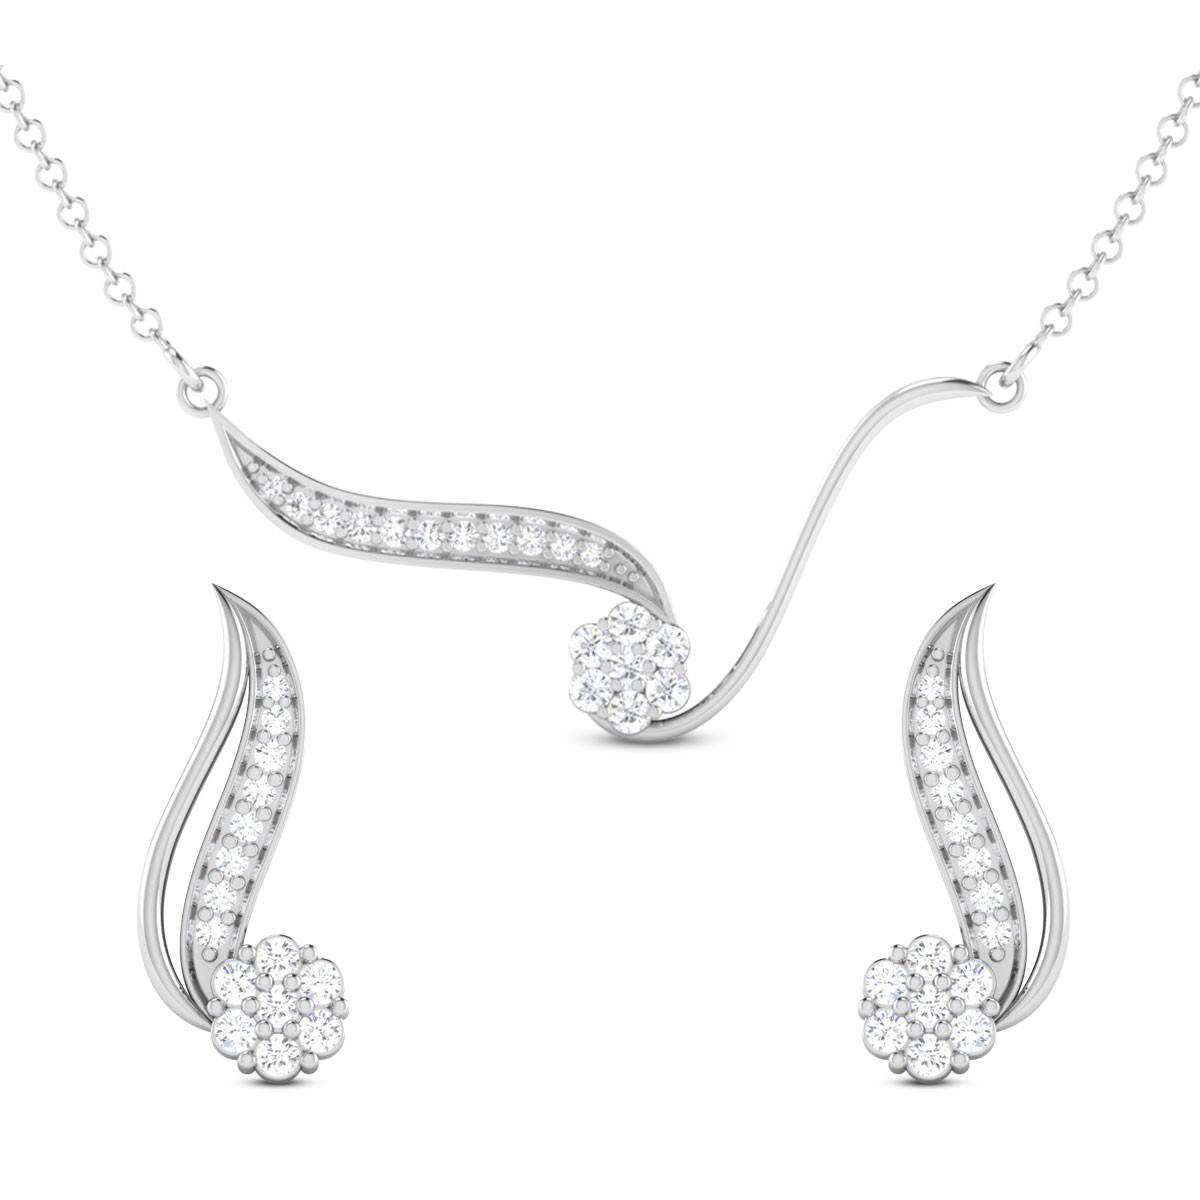 Kanak Floral Diamond Pendant Set